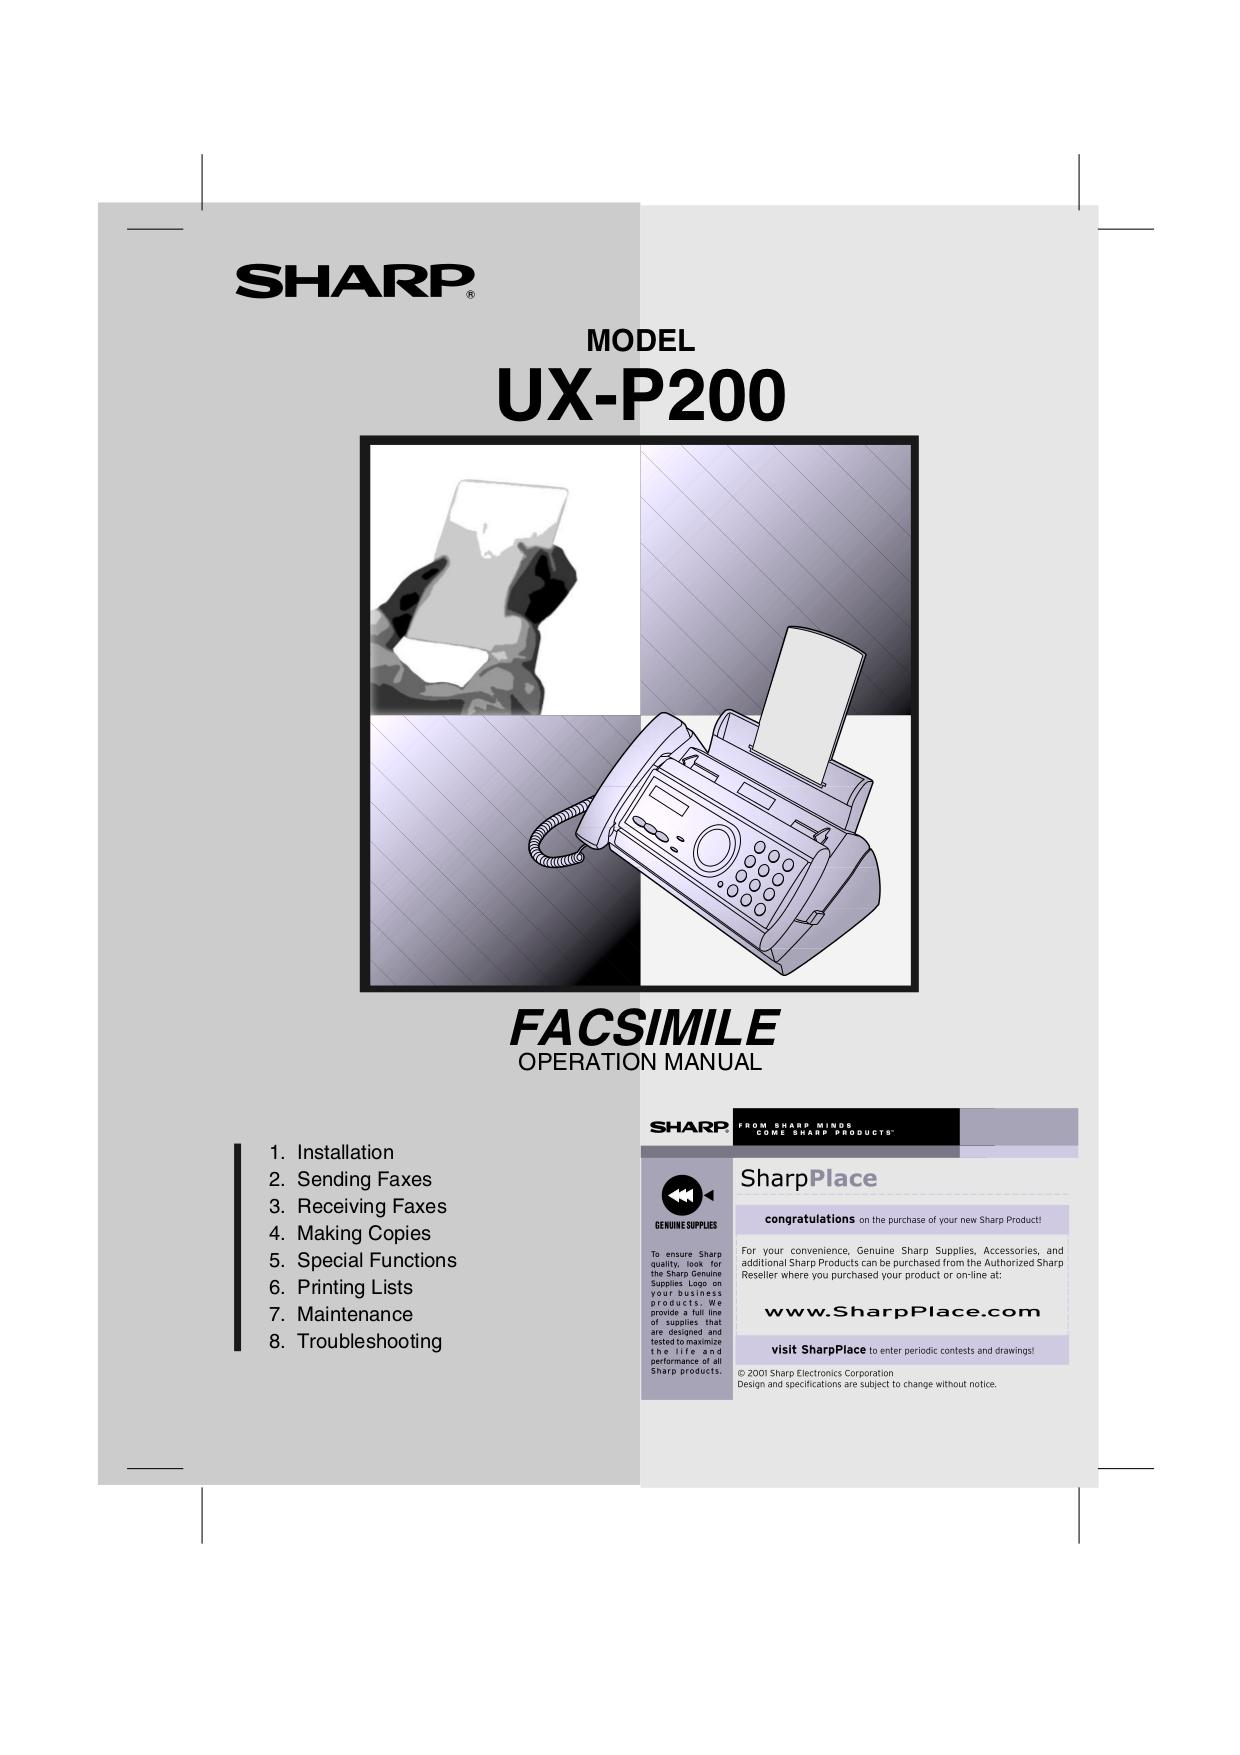 download free pdf for sharp ux p200 fax machine manual rh umlib com Sharp Fax Machine Telephone Sharp Fax Machines Product